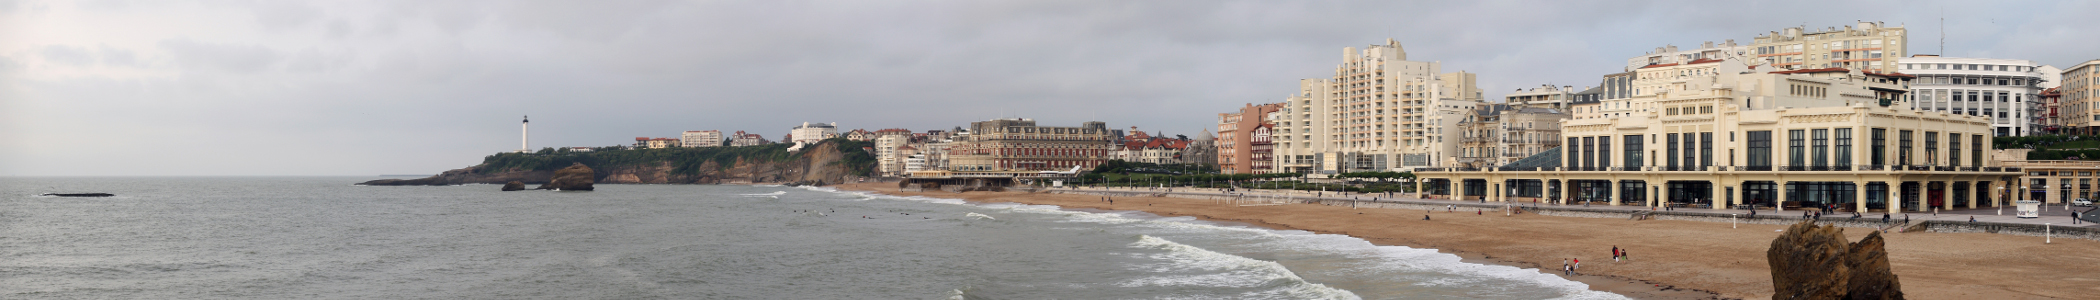 sommaire - Maison Moderne Biarritz